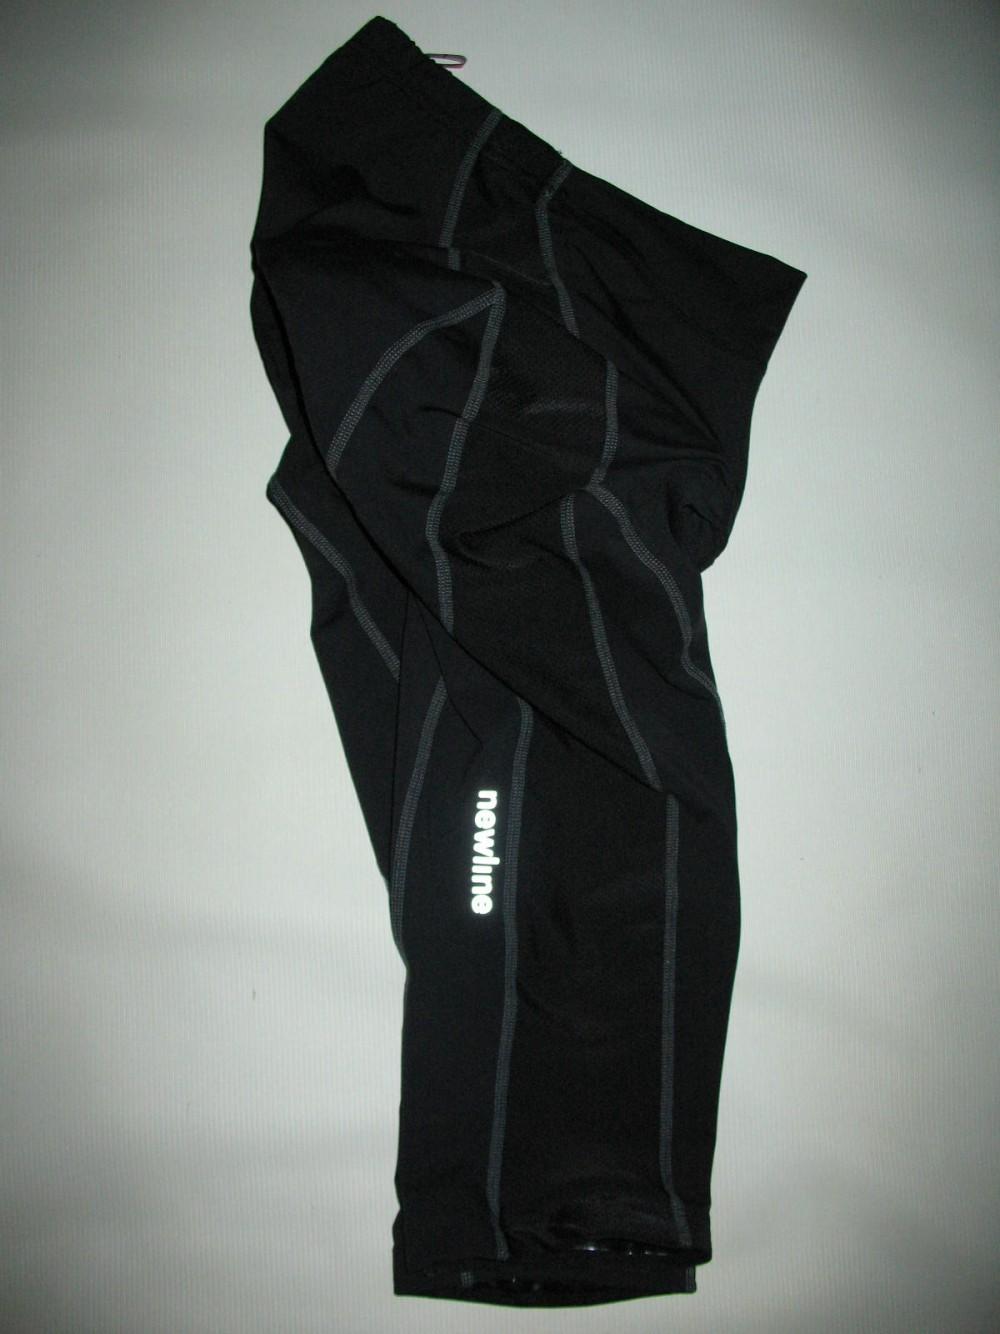 Велошорты NEWLINE cycling shorts lady (размер S/M) - 1